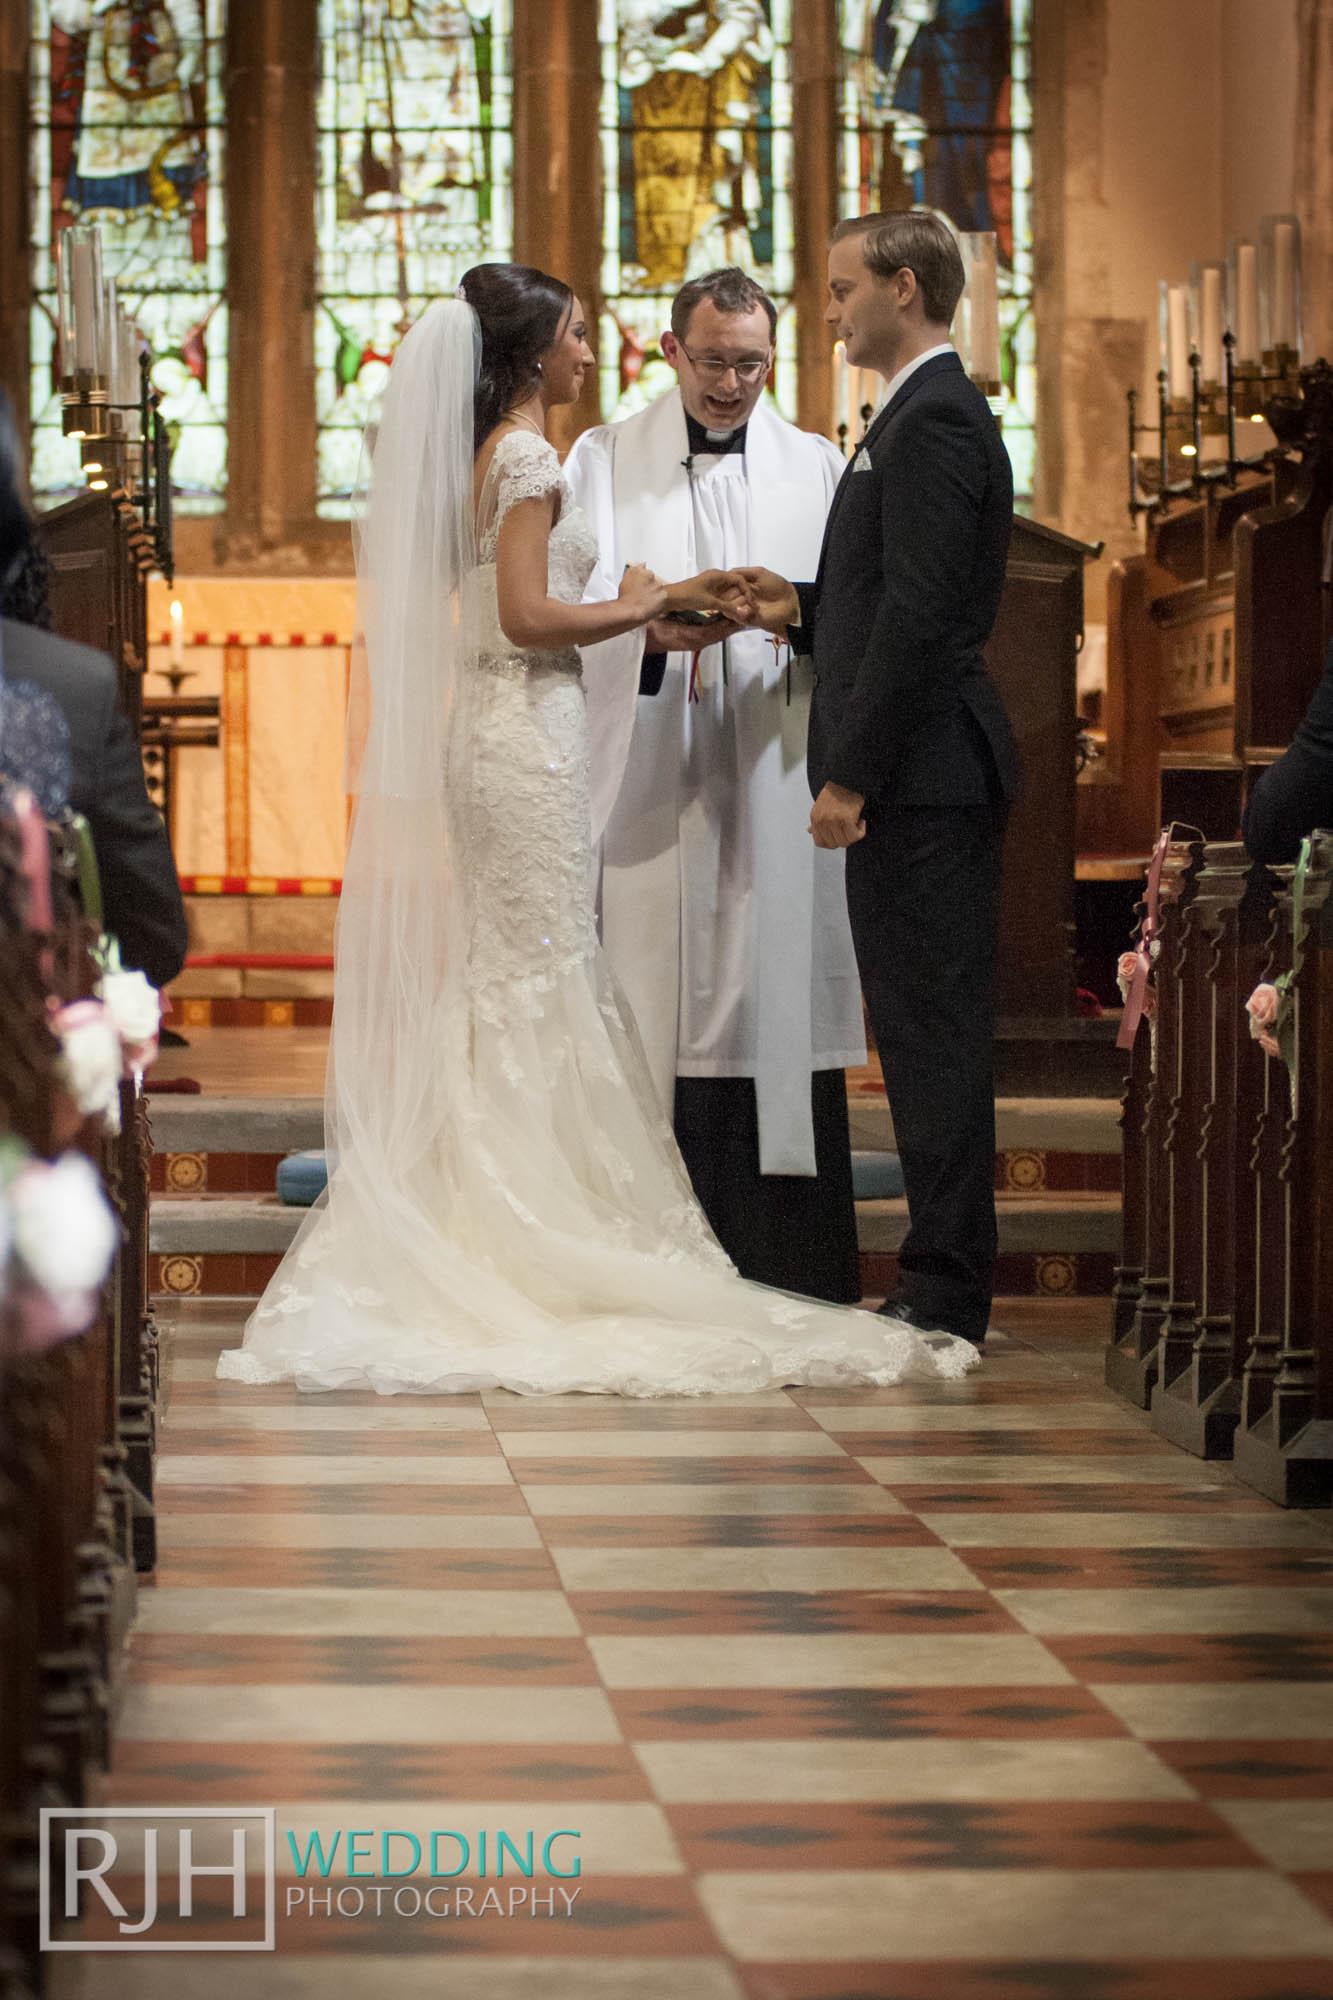 RJH Wedding Photography_Tankersley Manor Wedding_20.jpg